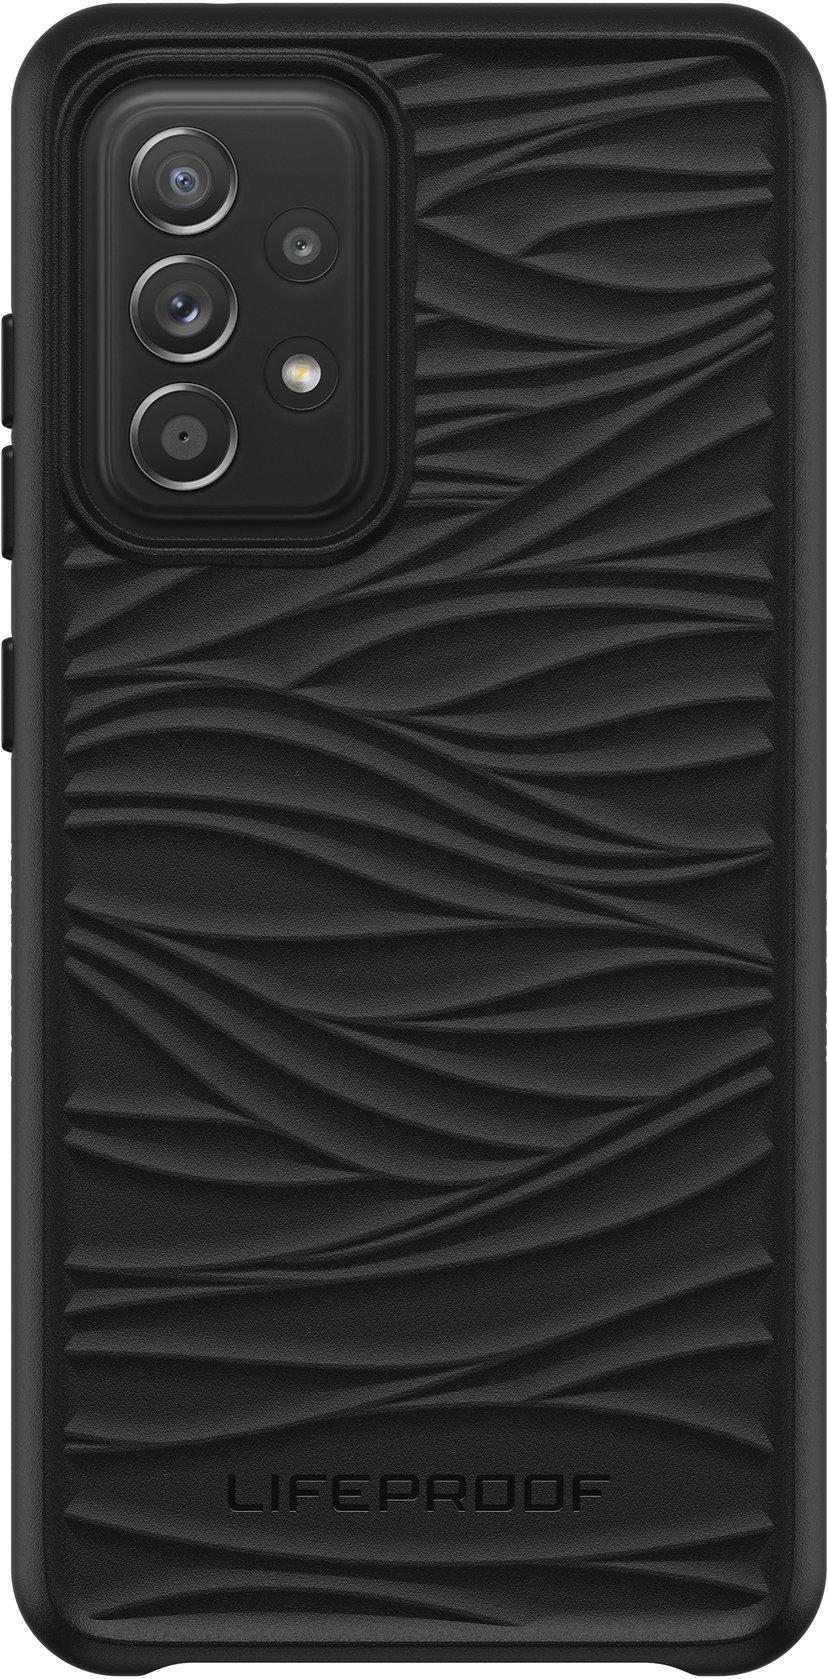 Otterbox LifeProof WAKE Samsung Galaxy A52, Samsung Galaxy A52 5G Svart